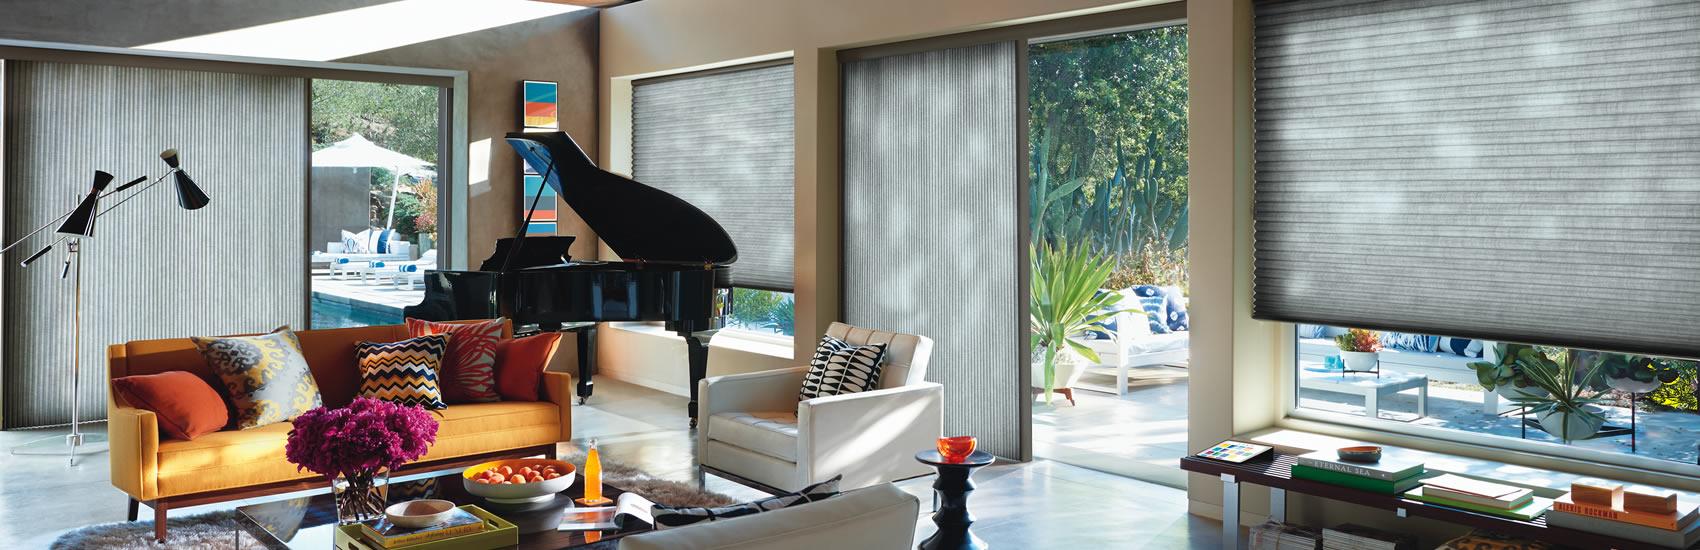 Blinds Shades Shutters Window Treatments San Jose